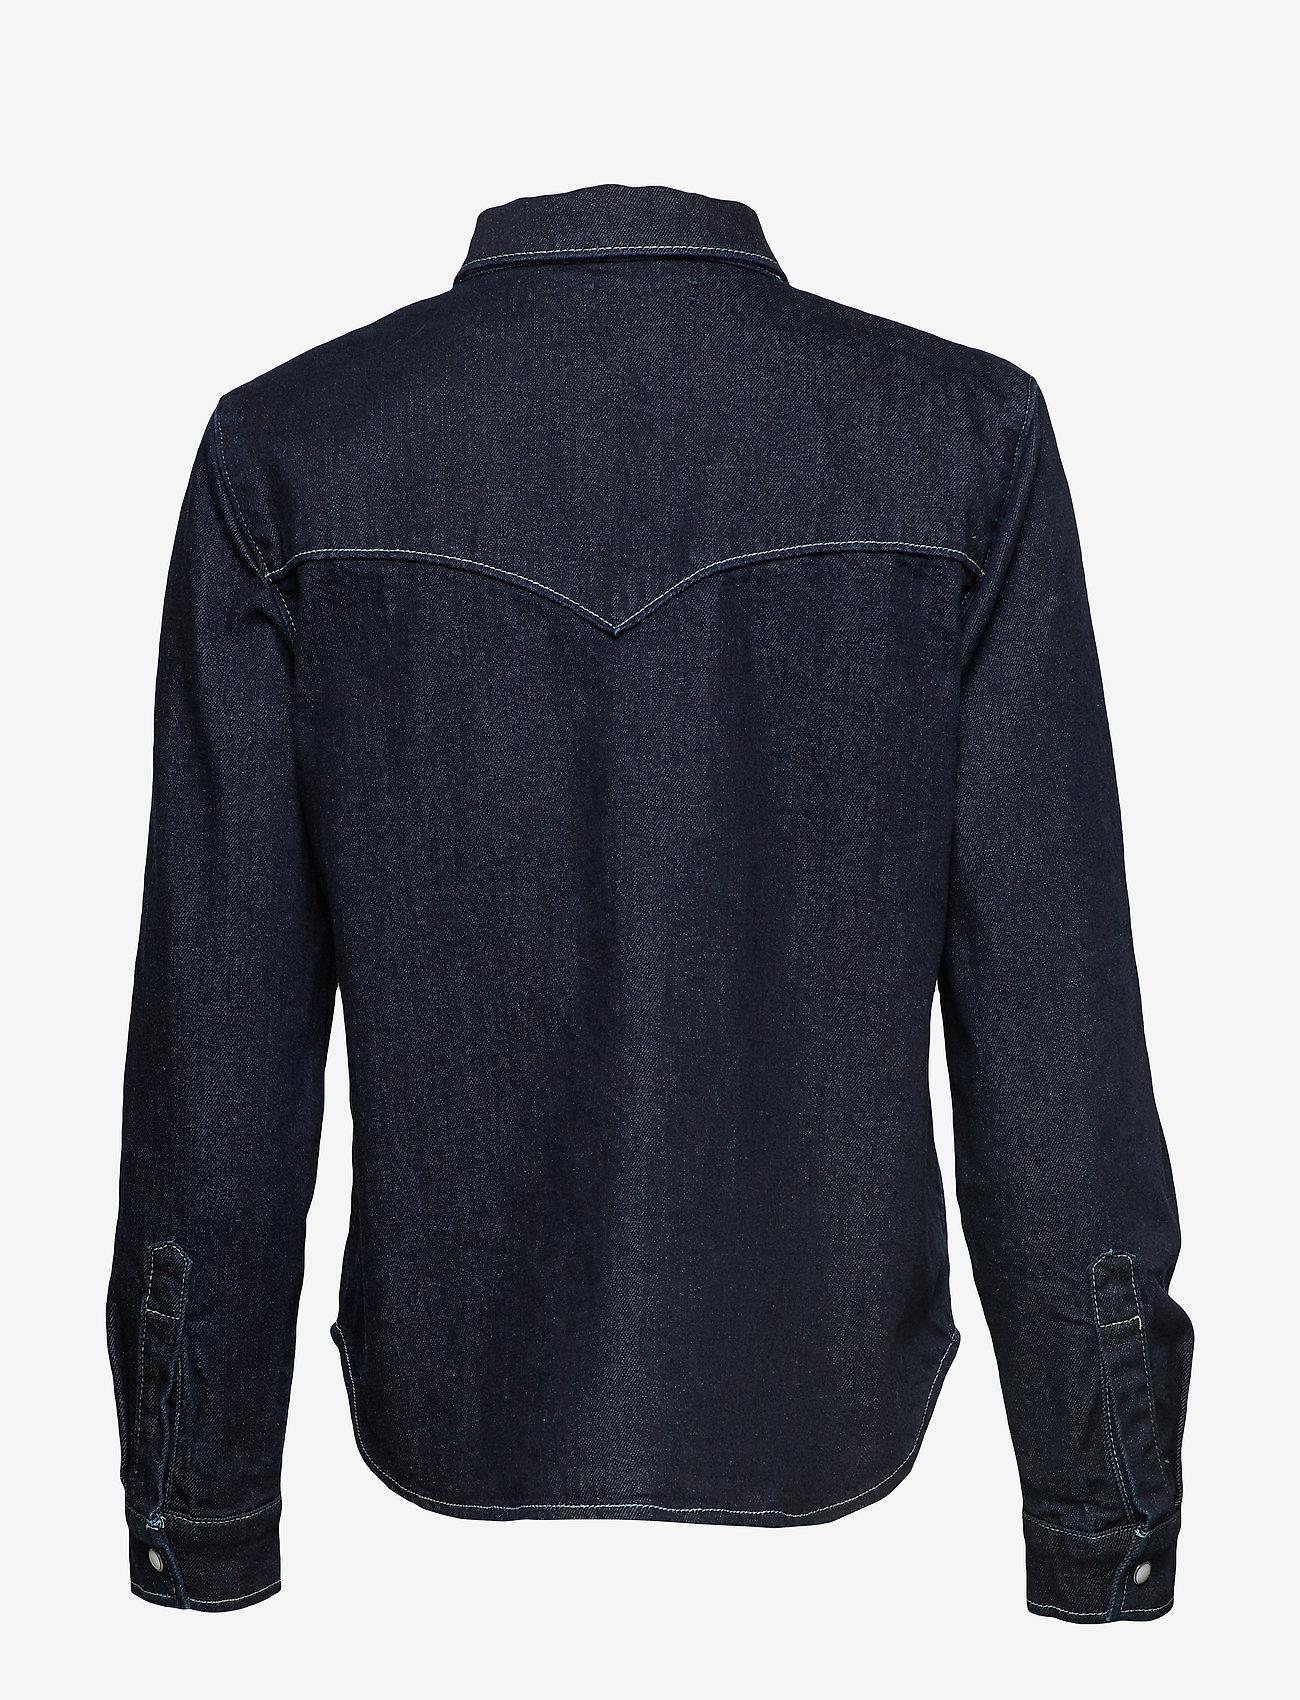 Levi's Made & Crafted - LMC S SHRNKN DNM SHIRT LMC SHR - chemises en jeans - dark indigo - flat finish